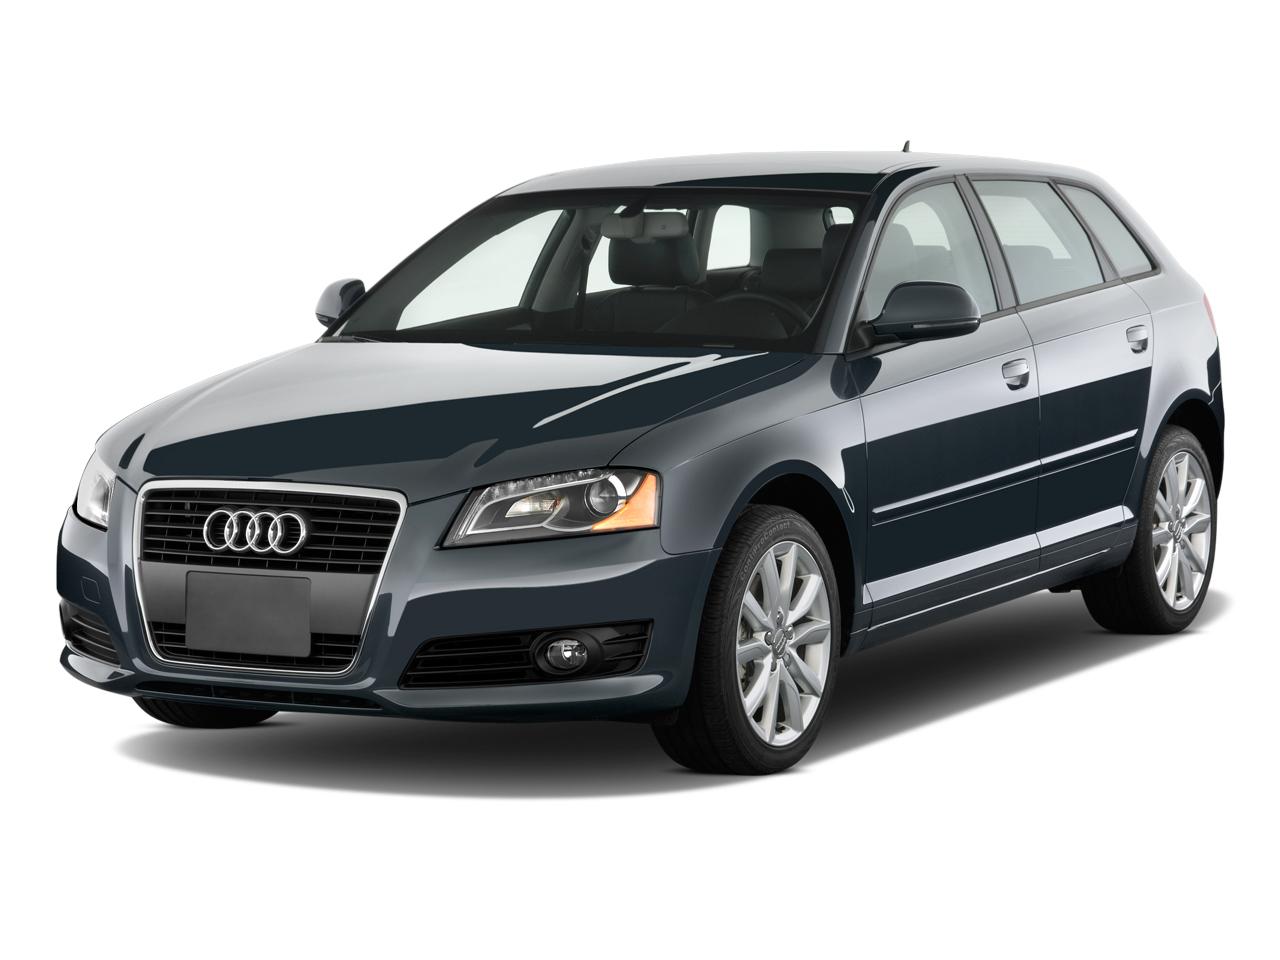 Best Used Hatchback 2013: The Car Connection's Picks